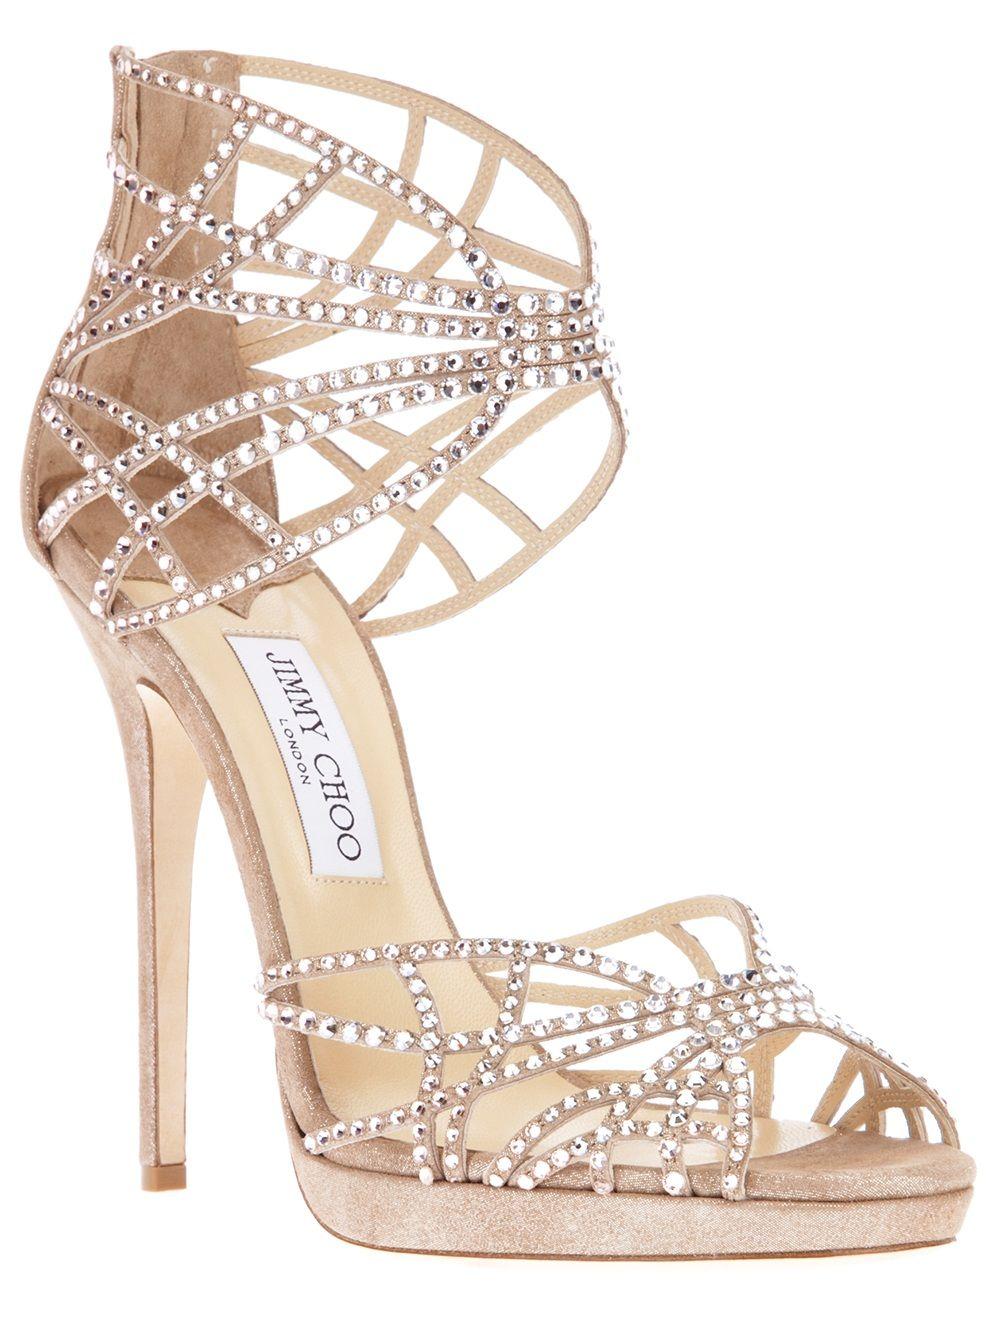 7314e979d8e JIMMY CHOO 'Diva' sandal pump | Dress Up in 2019 | Shoes, Prom shoes ...